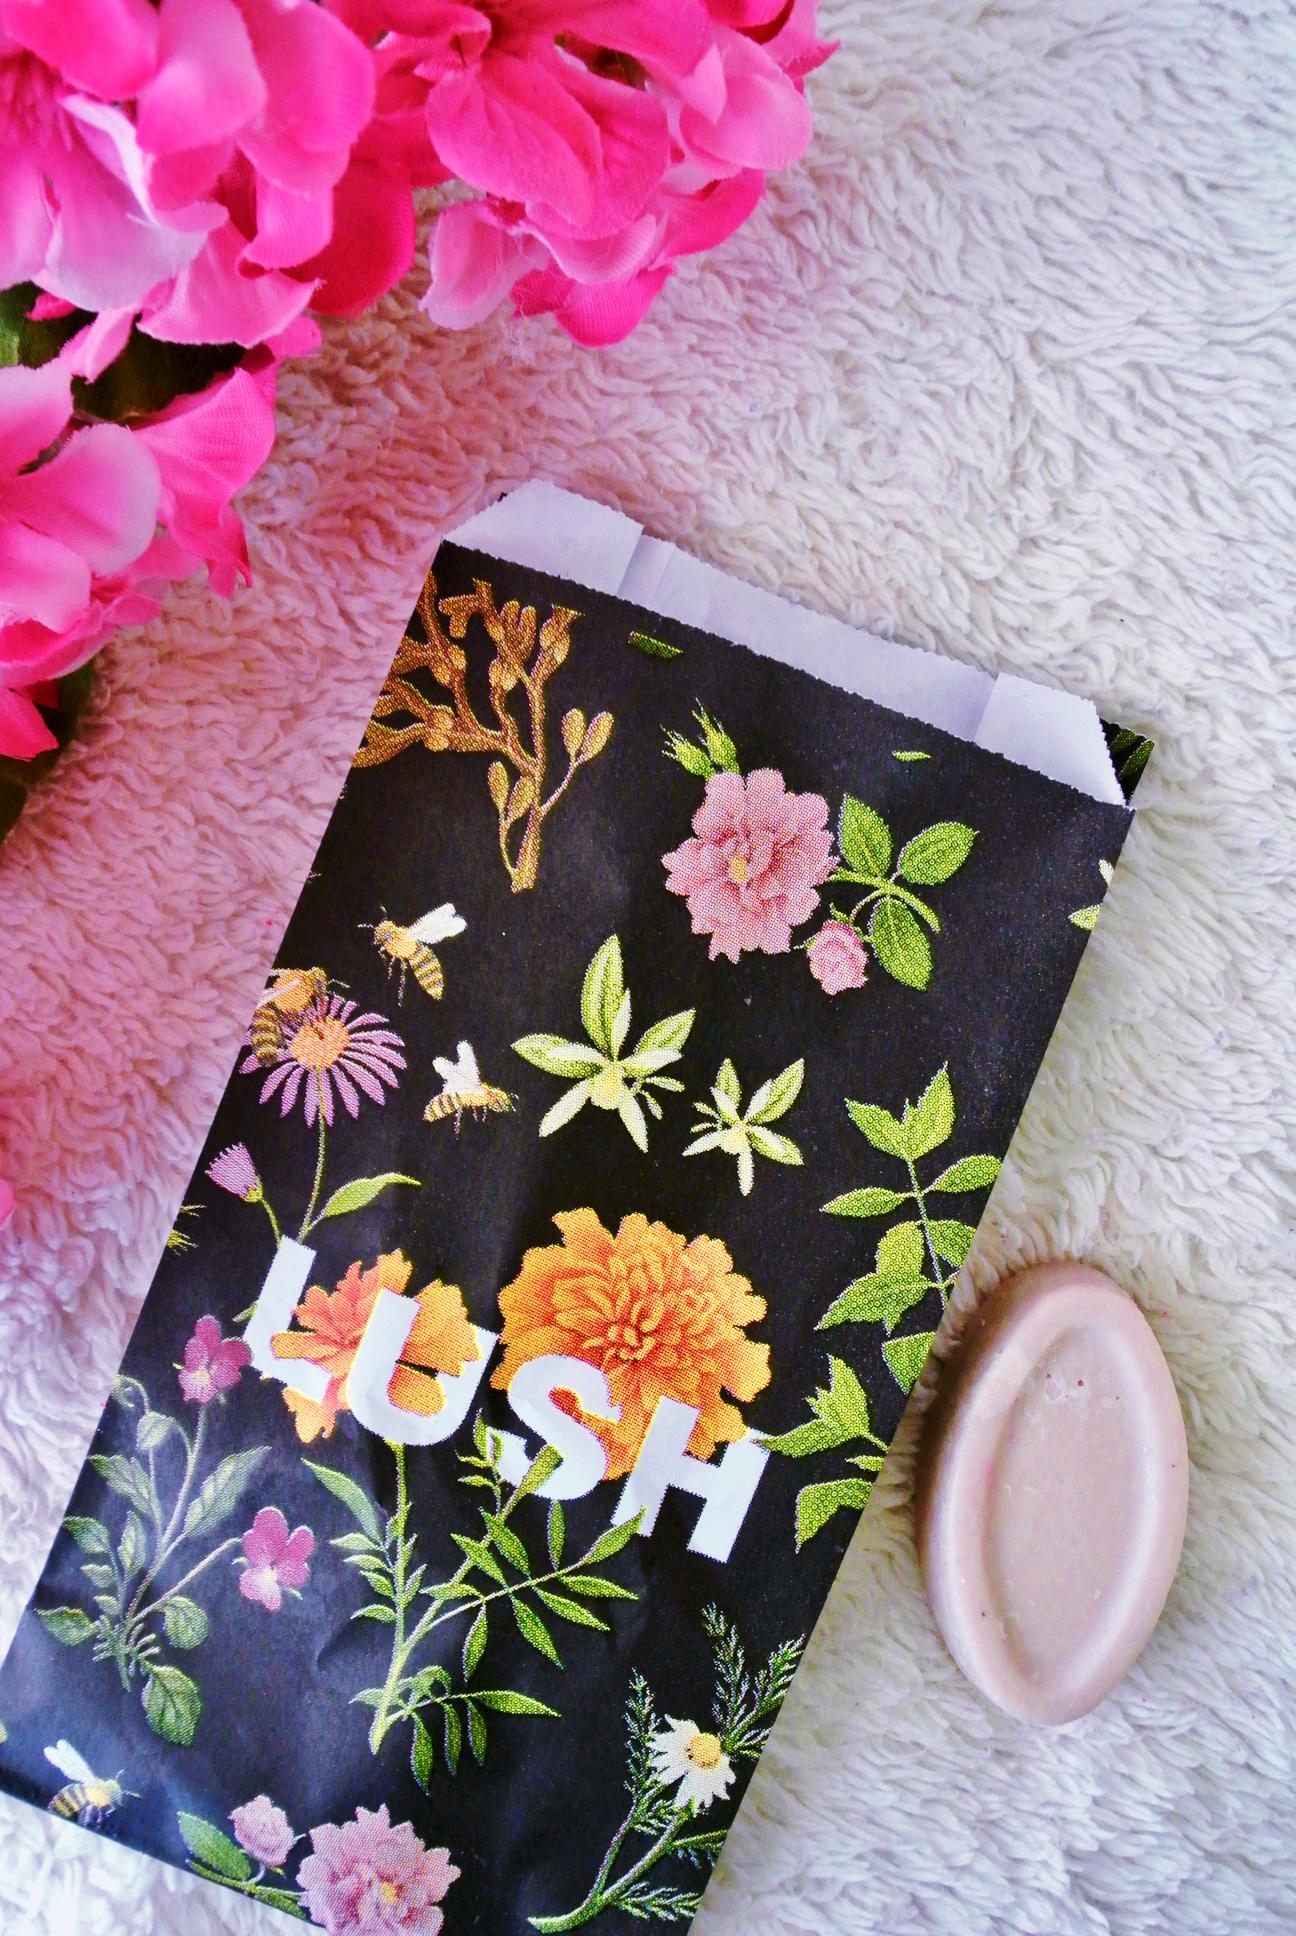 Lush Cosmetics Spring Mini-Haul // Full of Grace serum